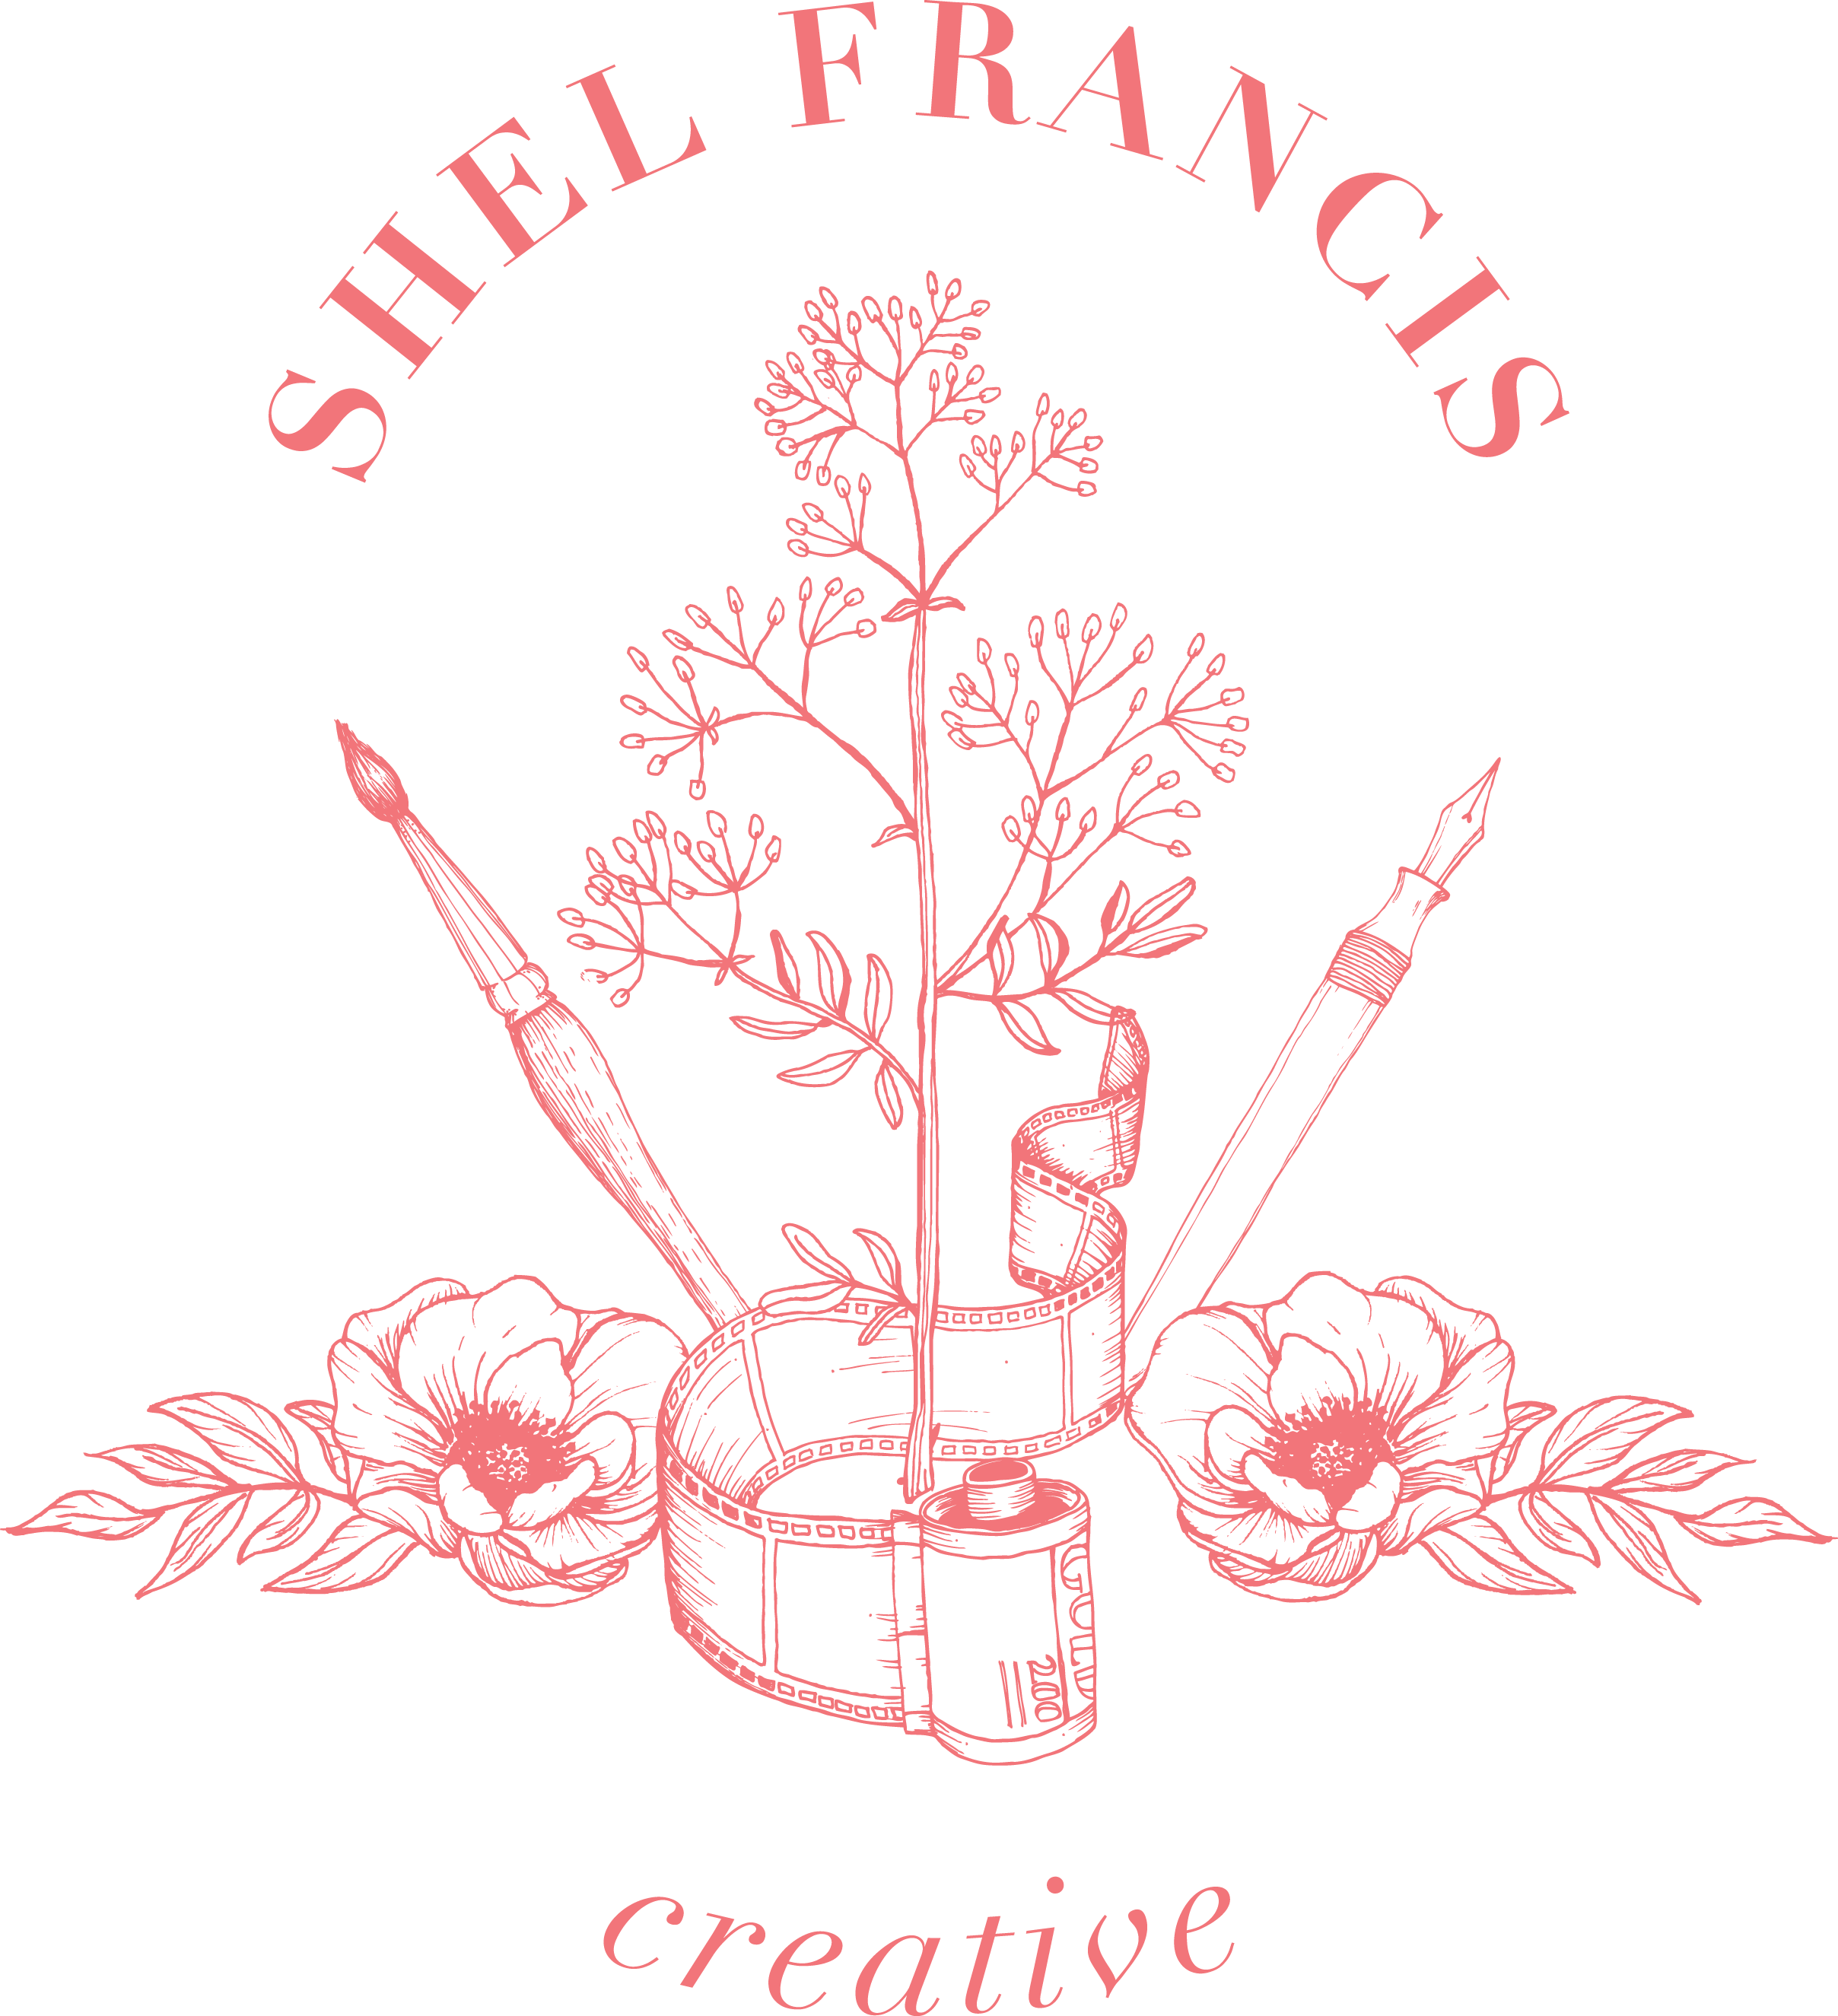 Shel Francis Creative